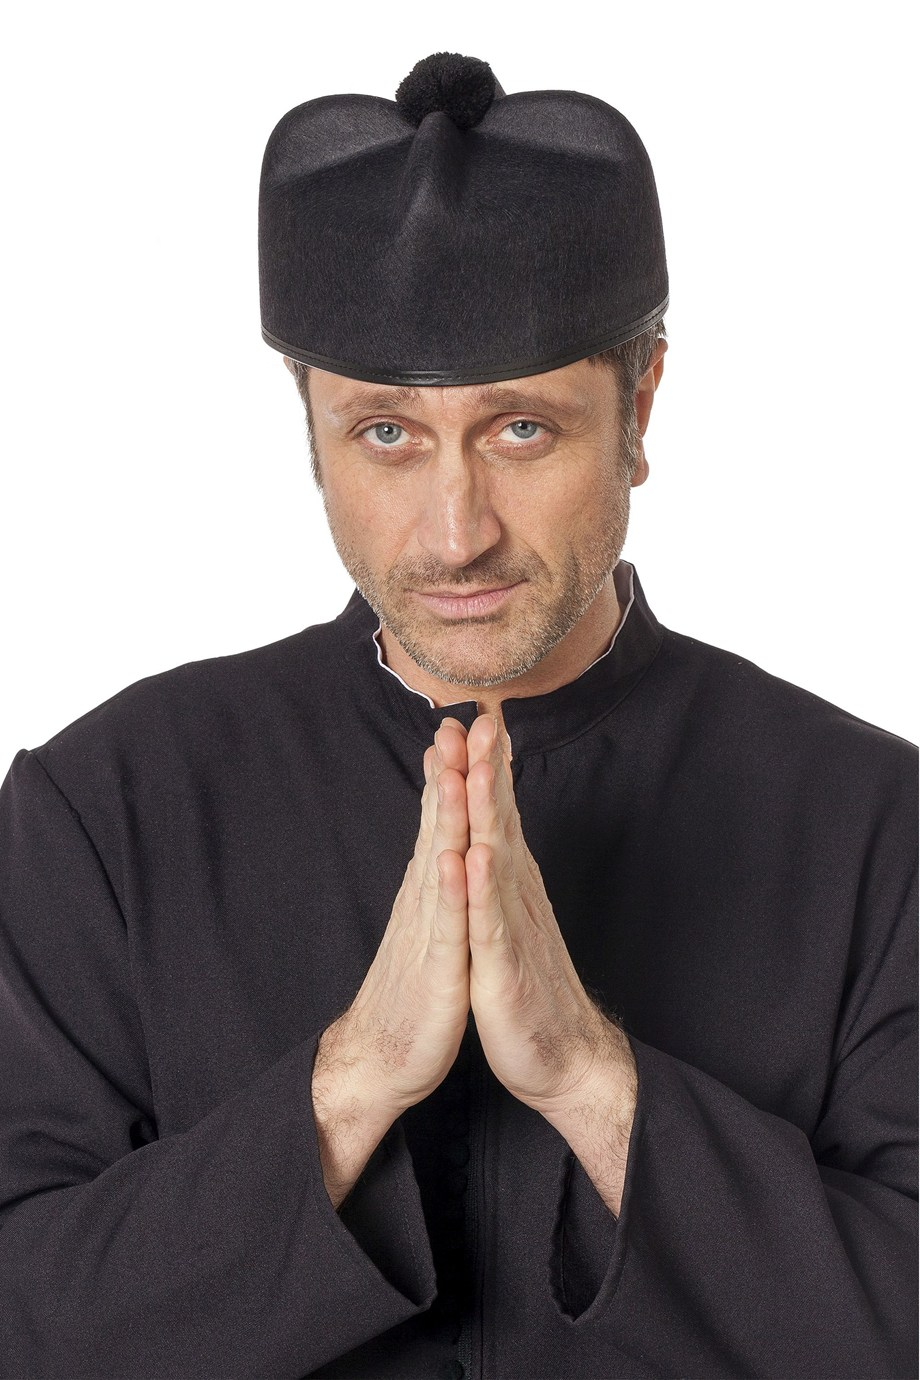 musta papin hattu